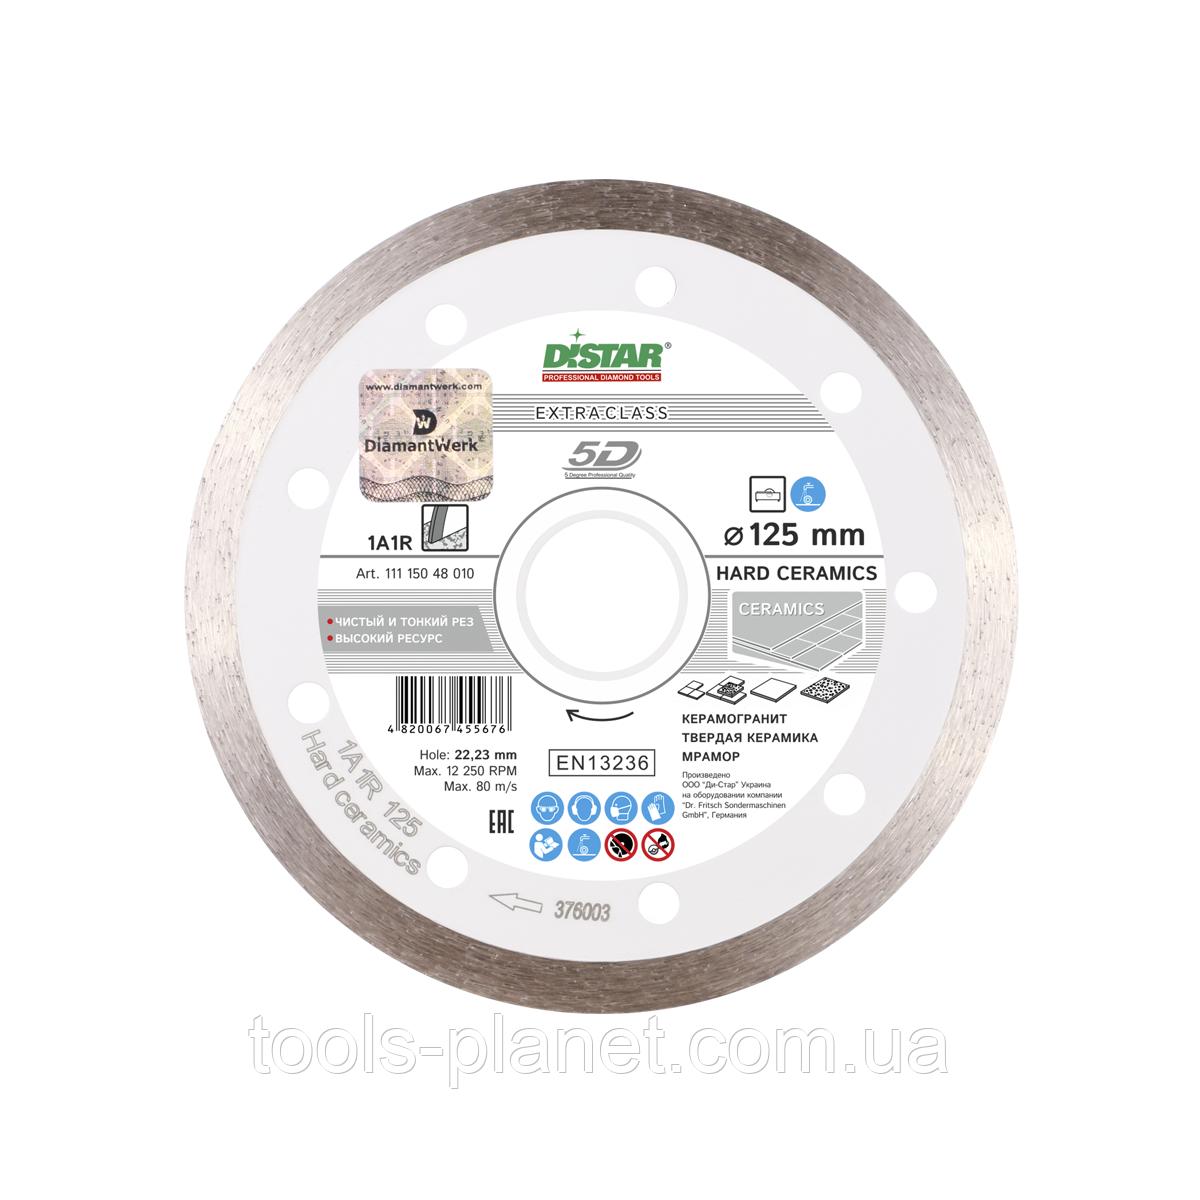 Алмазный диск Distar 1A1R 125 x 1,4 x 10 x 22,23 Hard Ceramics 5D (11115048010), фото 1